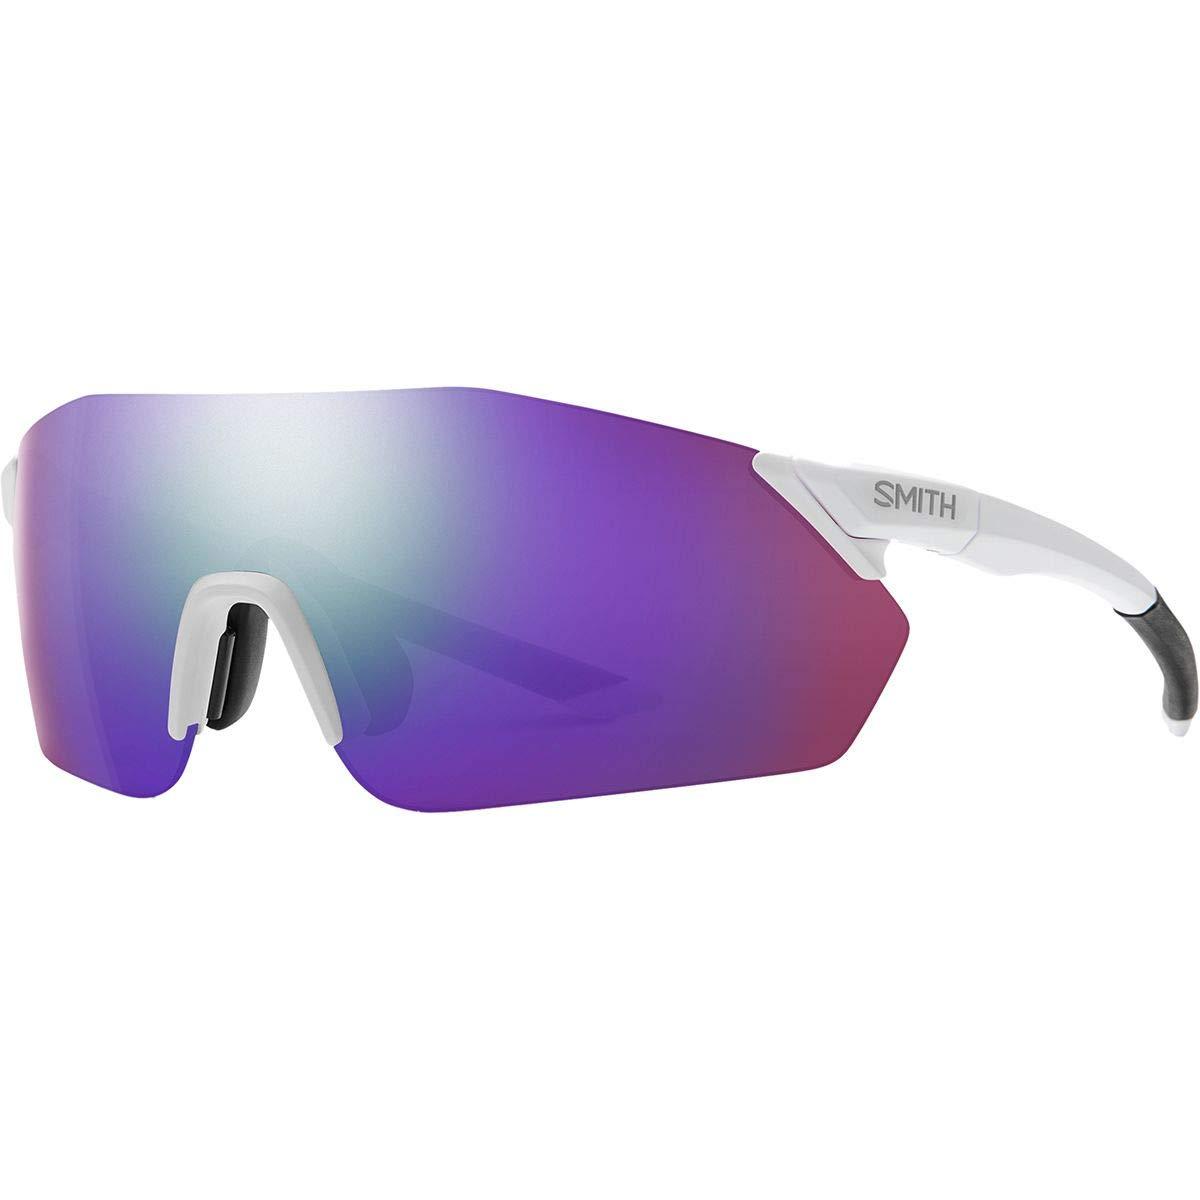 Smith Optics Reverb Sunglasses Chromapop+